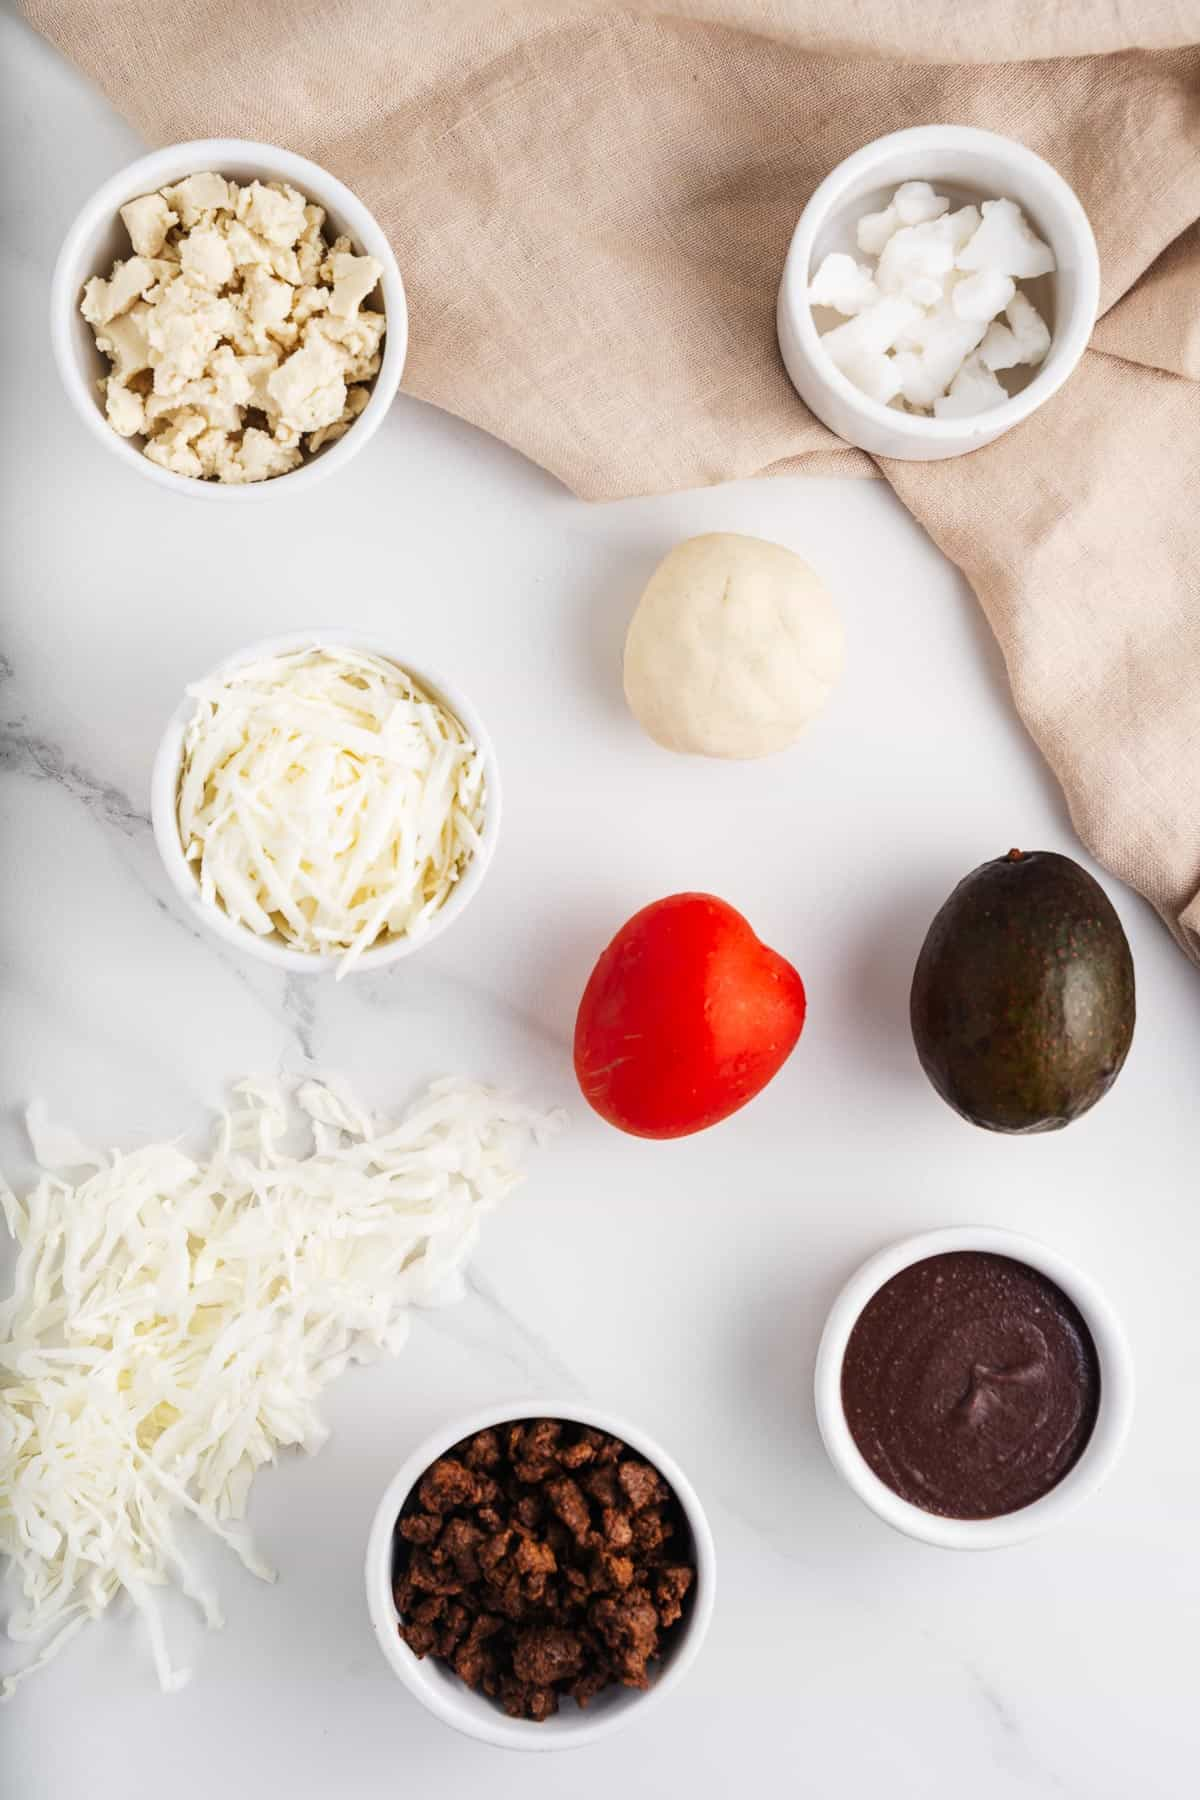 Vegan Mozzarella, Queso Fresco, Tomato, Masa, Avocado, Cabbage, Vegetable Shortening, Refried Beans, and Chorizo